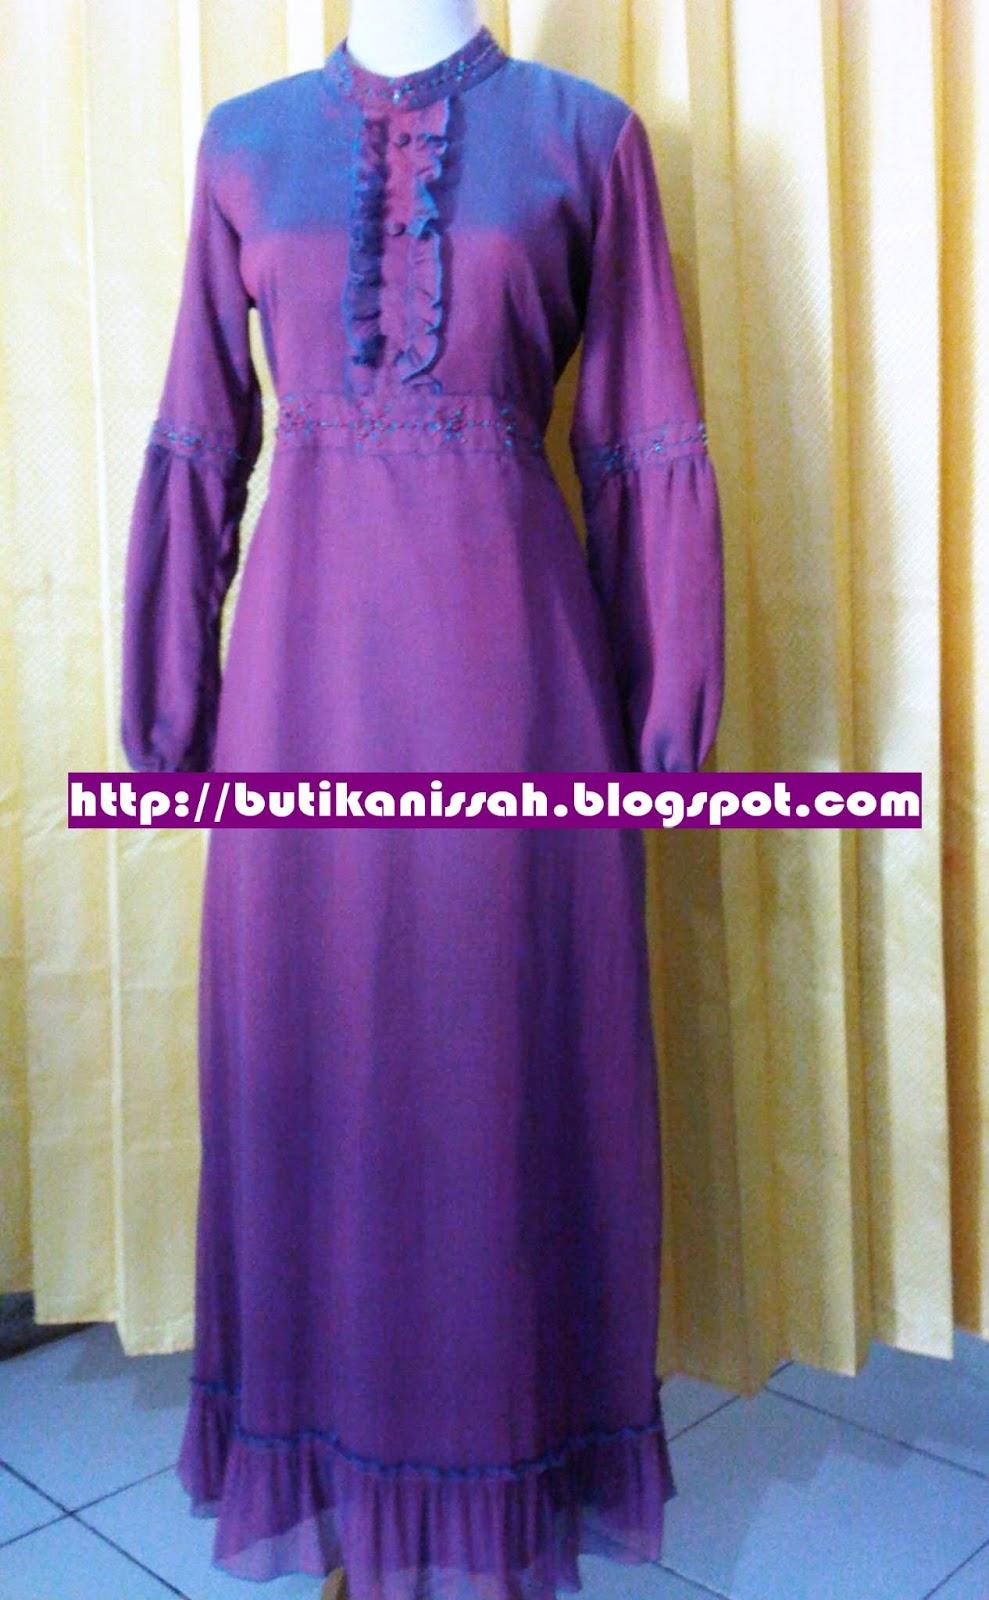 Pin butik baju muslimah di bandung on pinterest Baju gamis terbaru di bandung